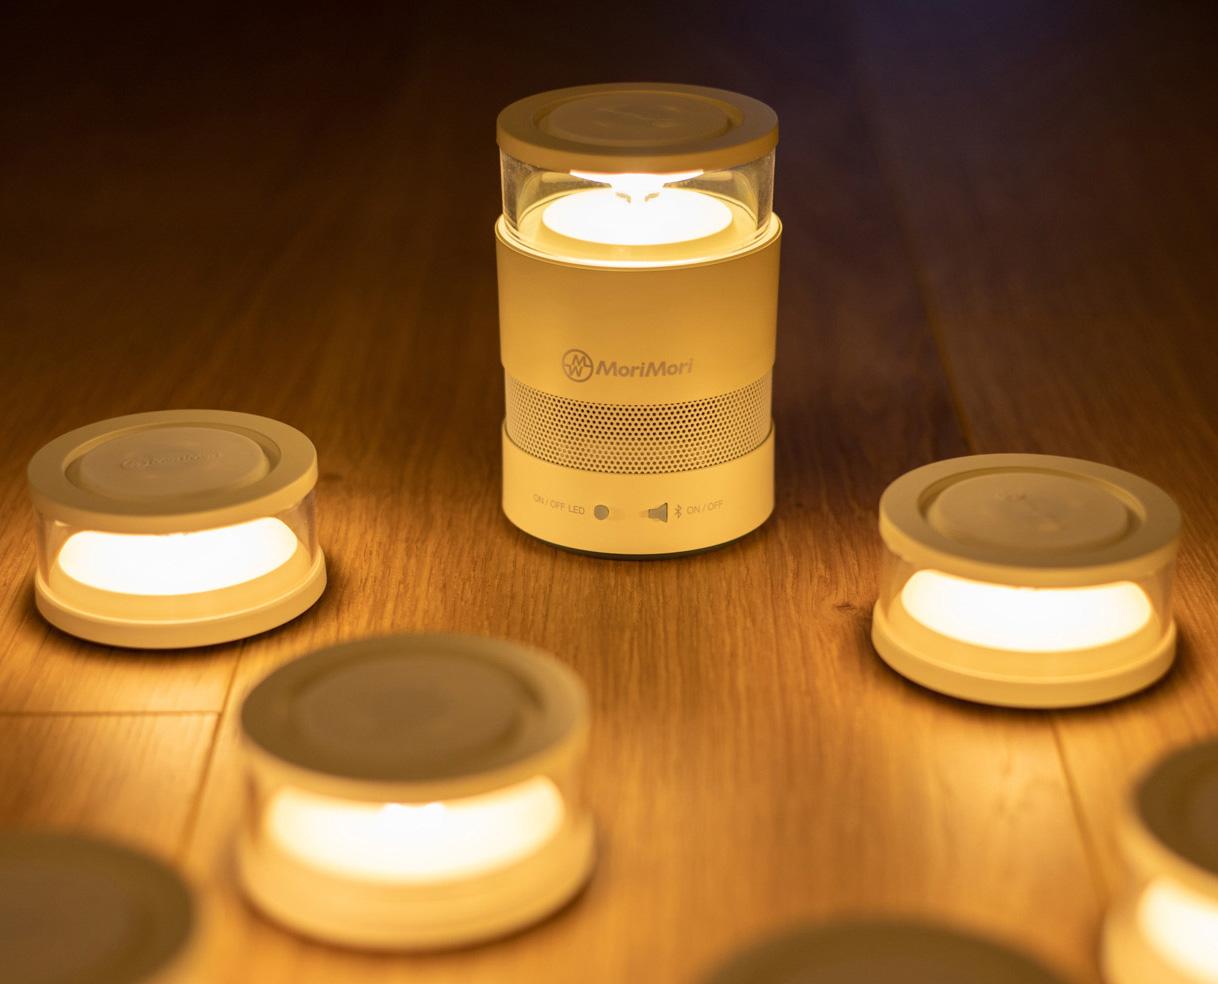 【MoriMori】LASMO Speaker 多功能LED燈 小夜燈 氣氛燈 照明燈 防水 可分離式燈 藍芽音響